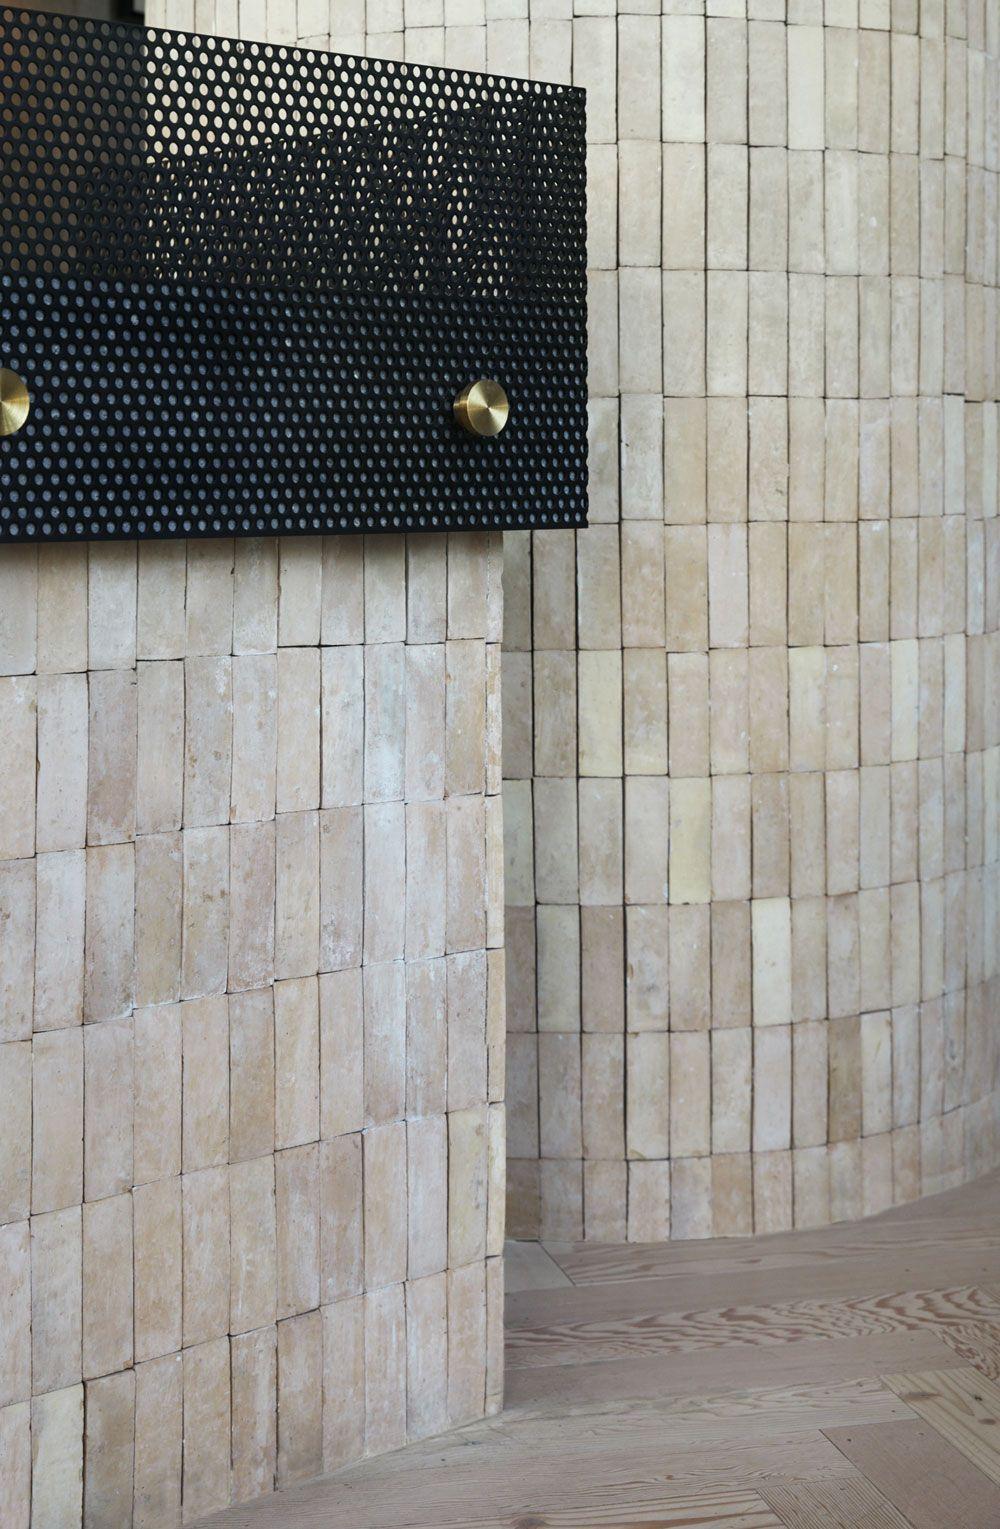 Auvers cafe by Matt Woods. Photo by Dave Wheeler. #interior #hospitality #interiordesign #brick